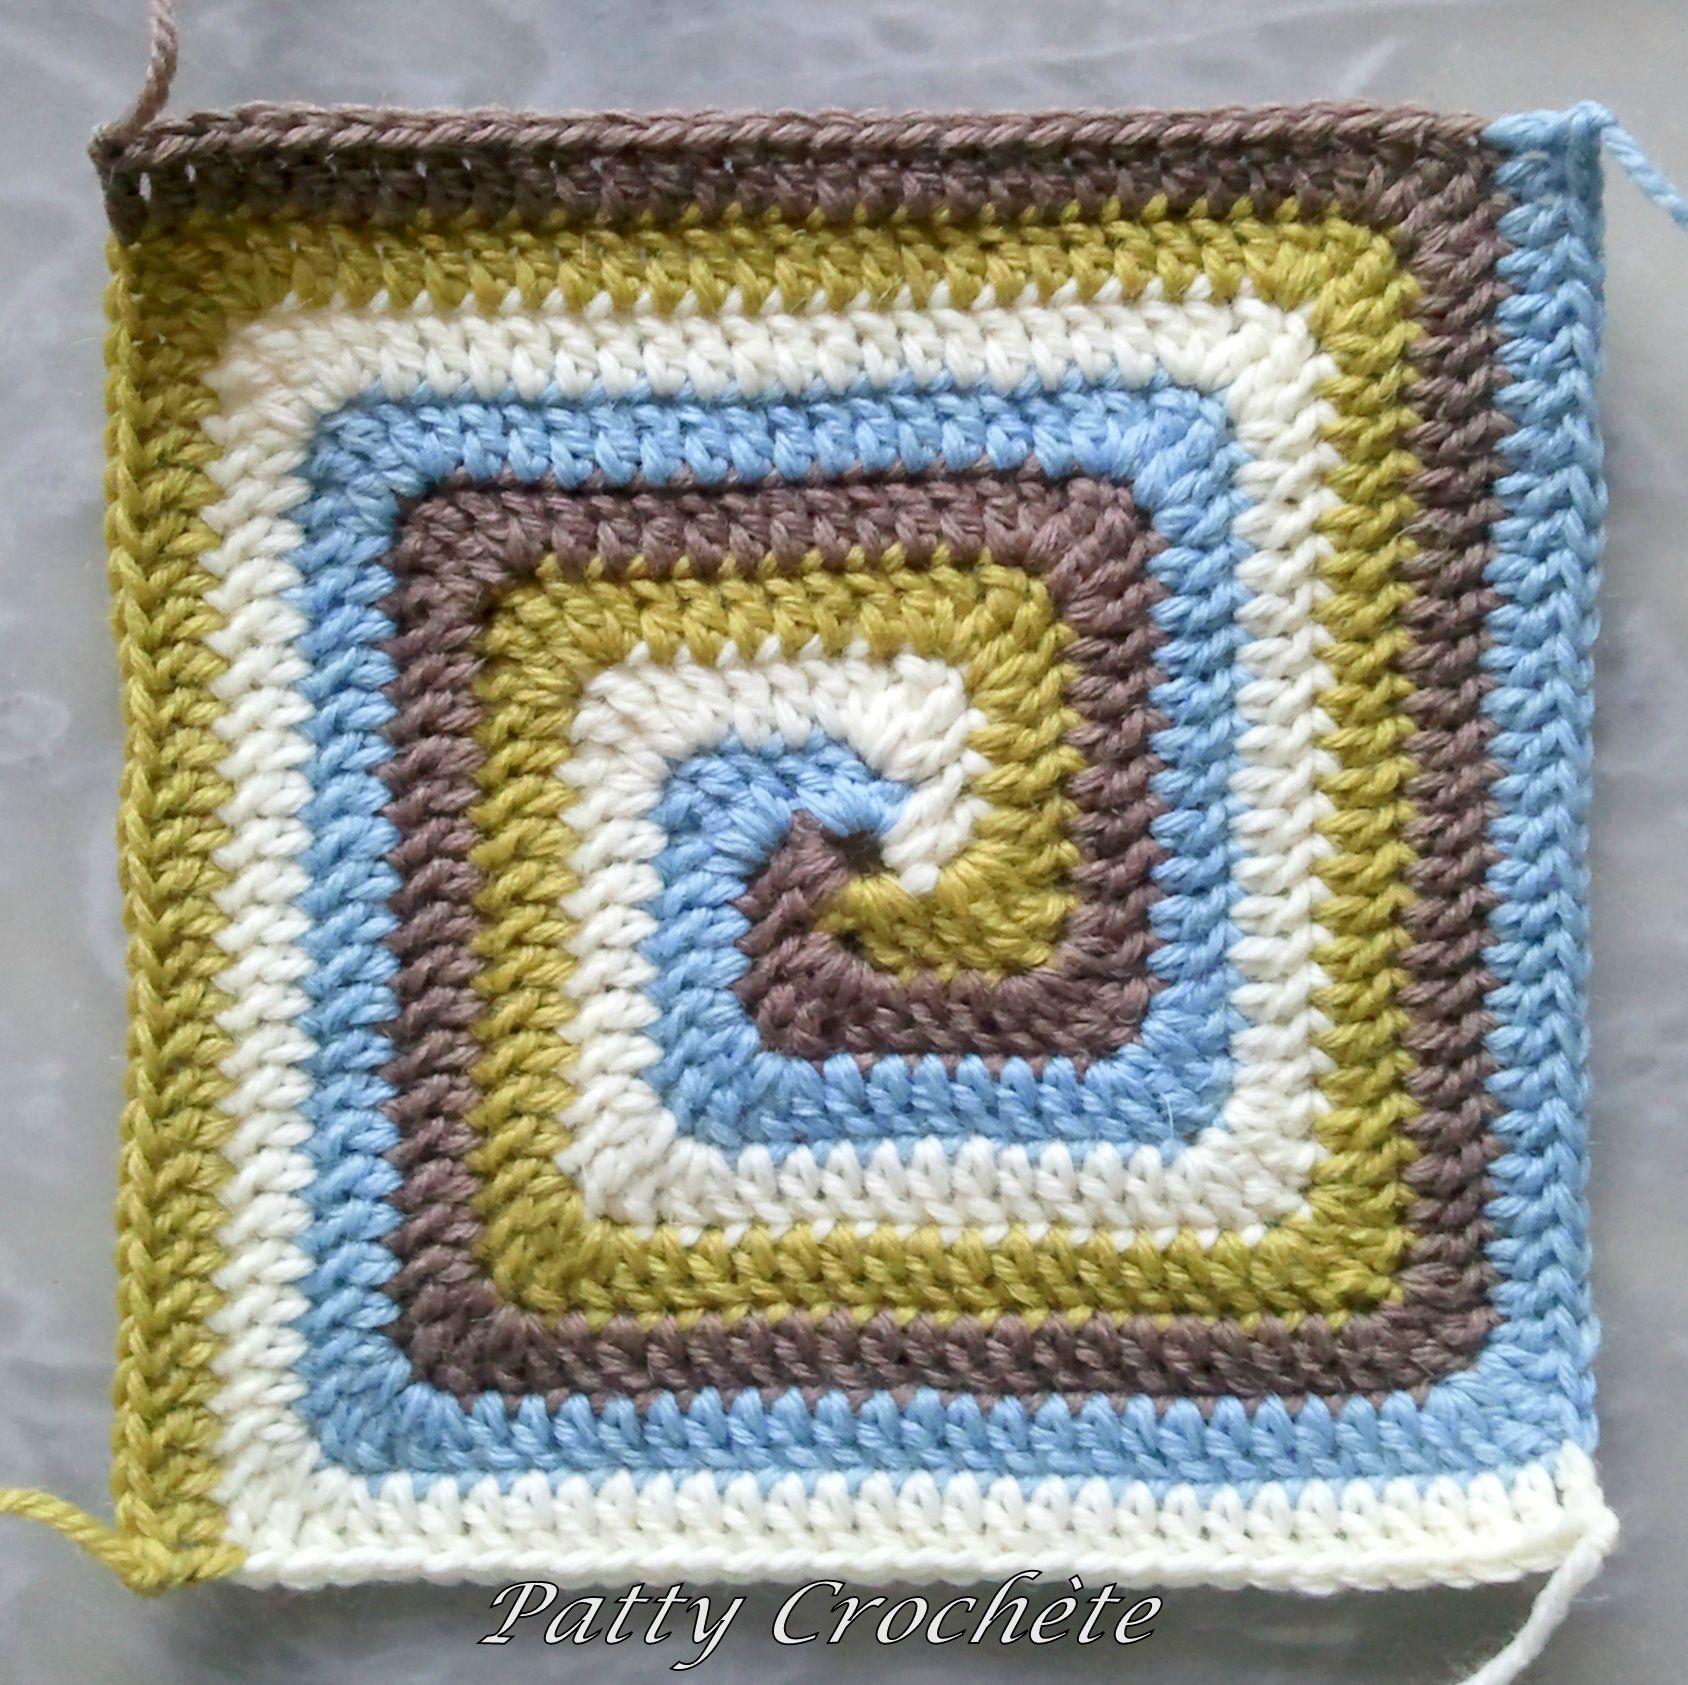 Spiral crochet square | tejiendo | Pinterest | Tejido, Ganchillo y Manta